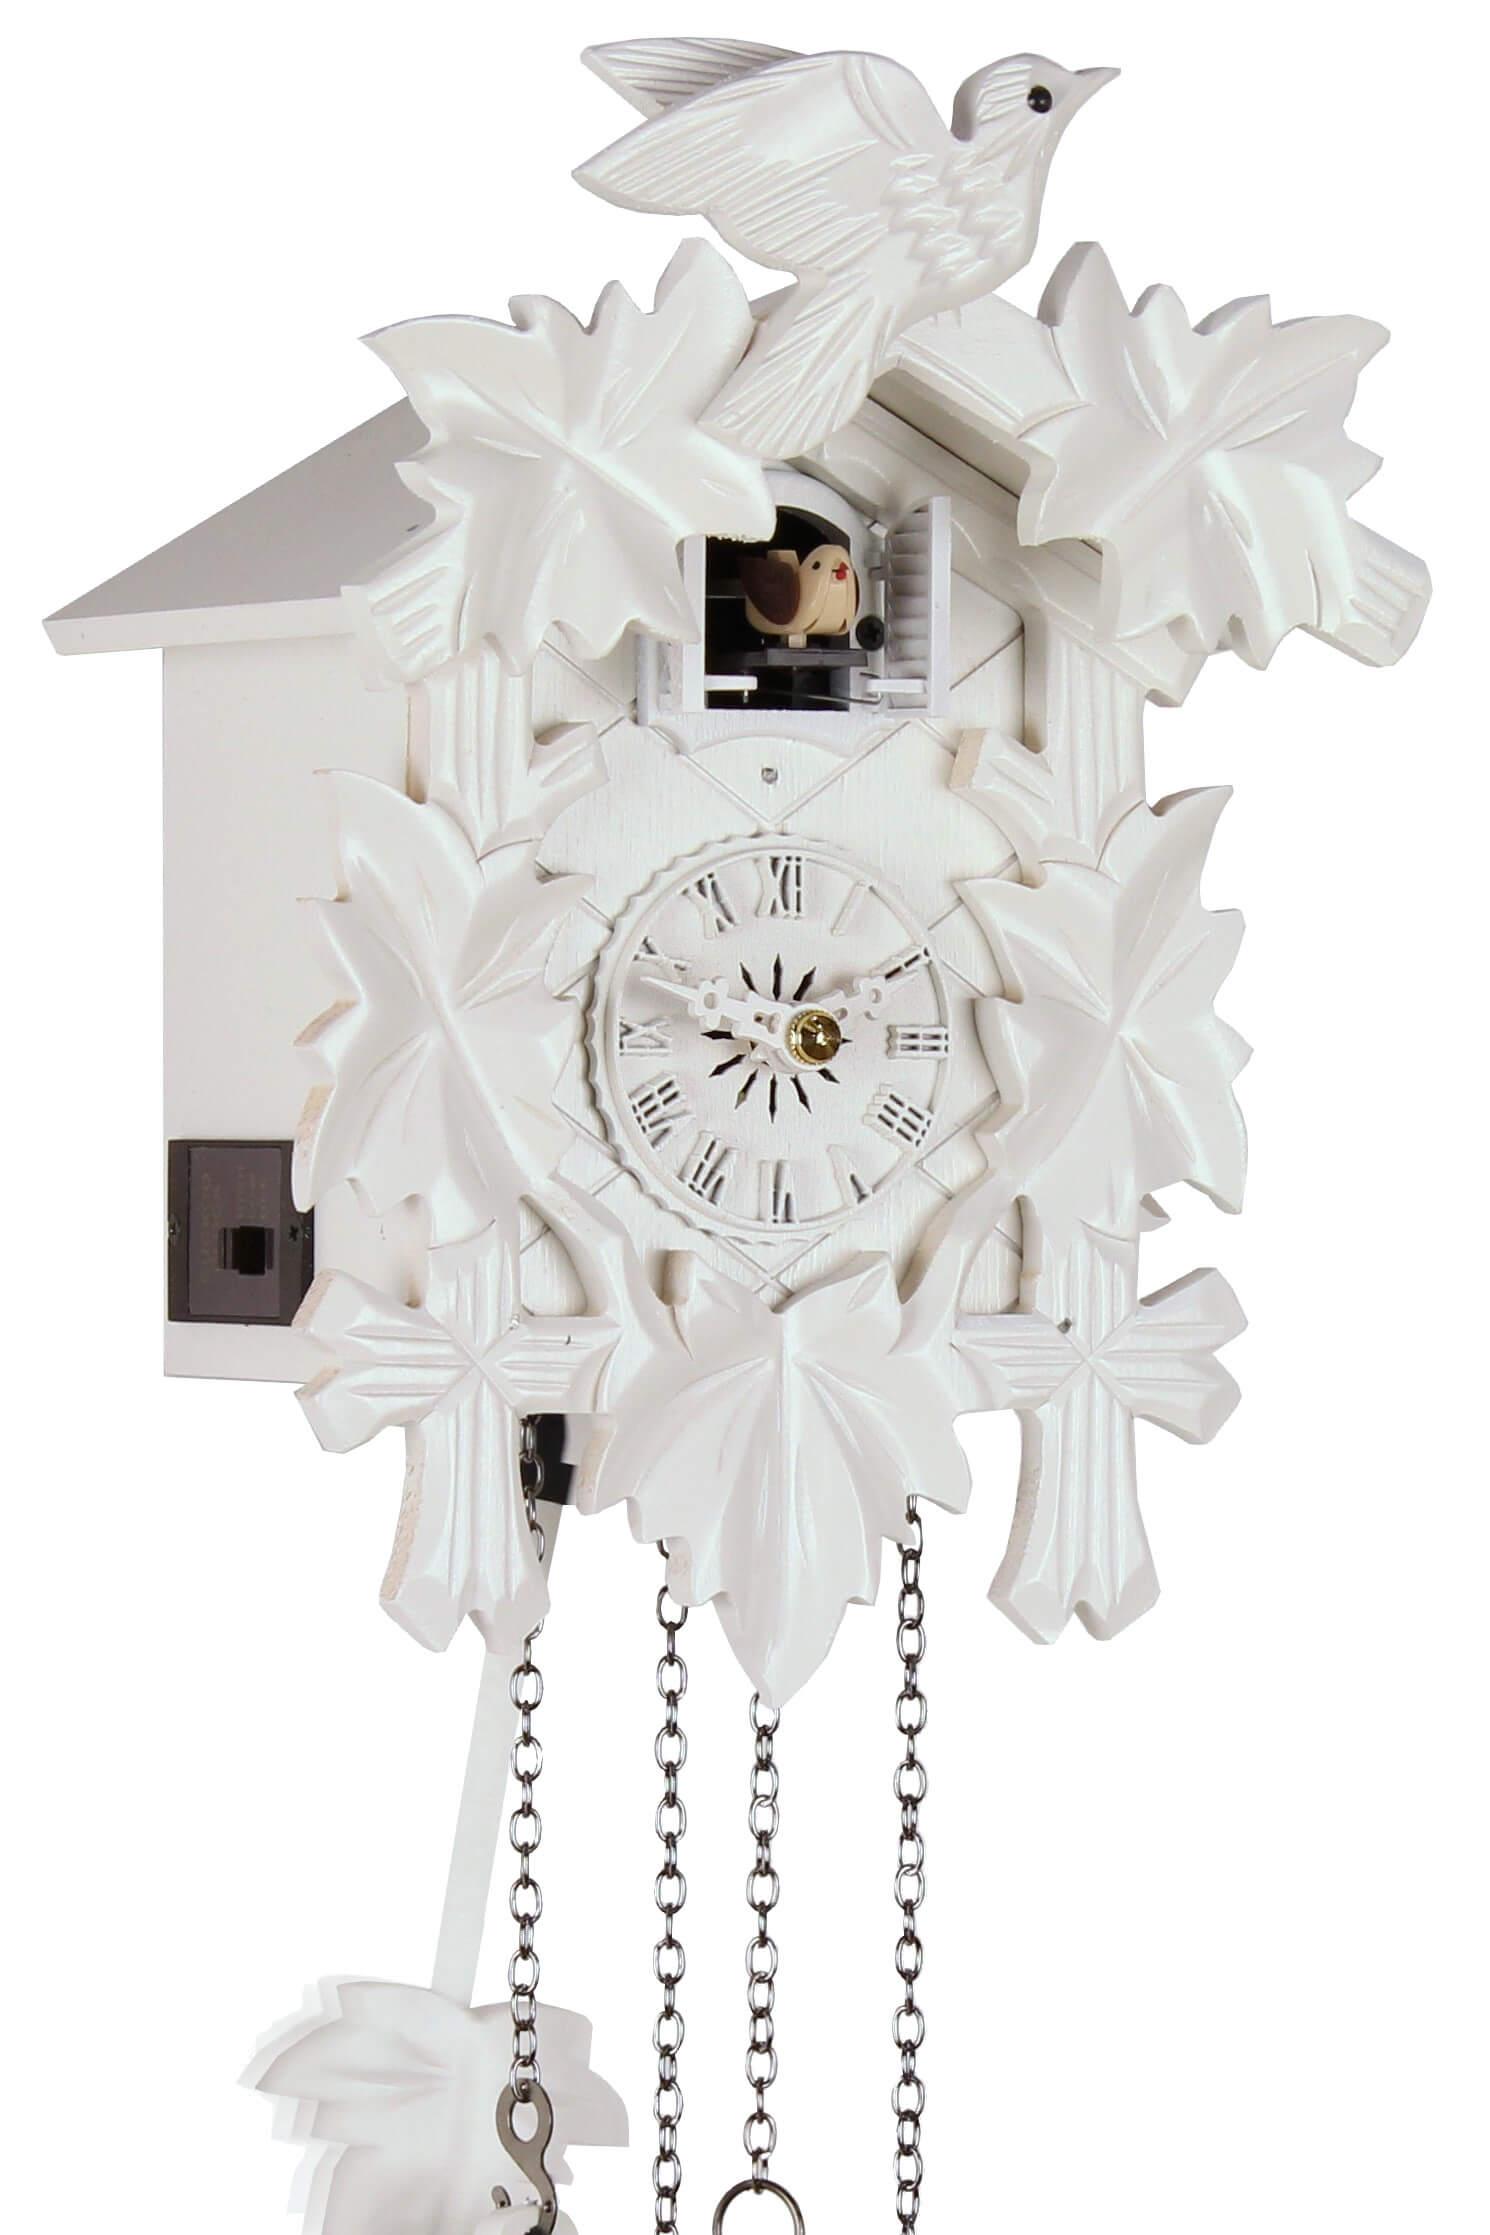 f nflaub wei 25cm kuckucksuhr kuckuckuhr echtholz neu batte ebay. Black Bedroom Furniture Sets. Home Design Ideas